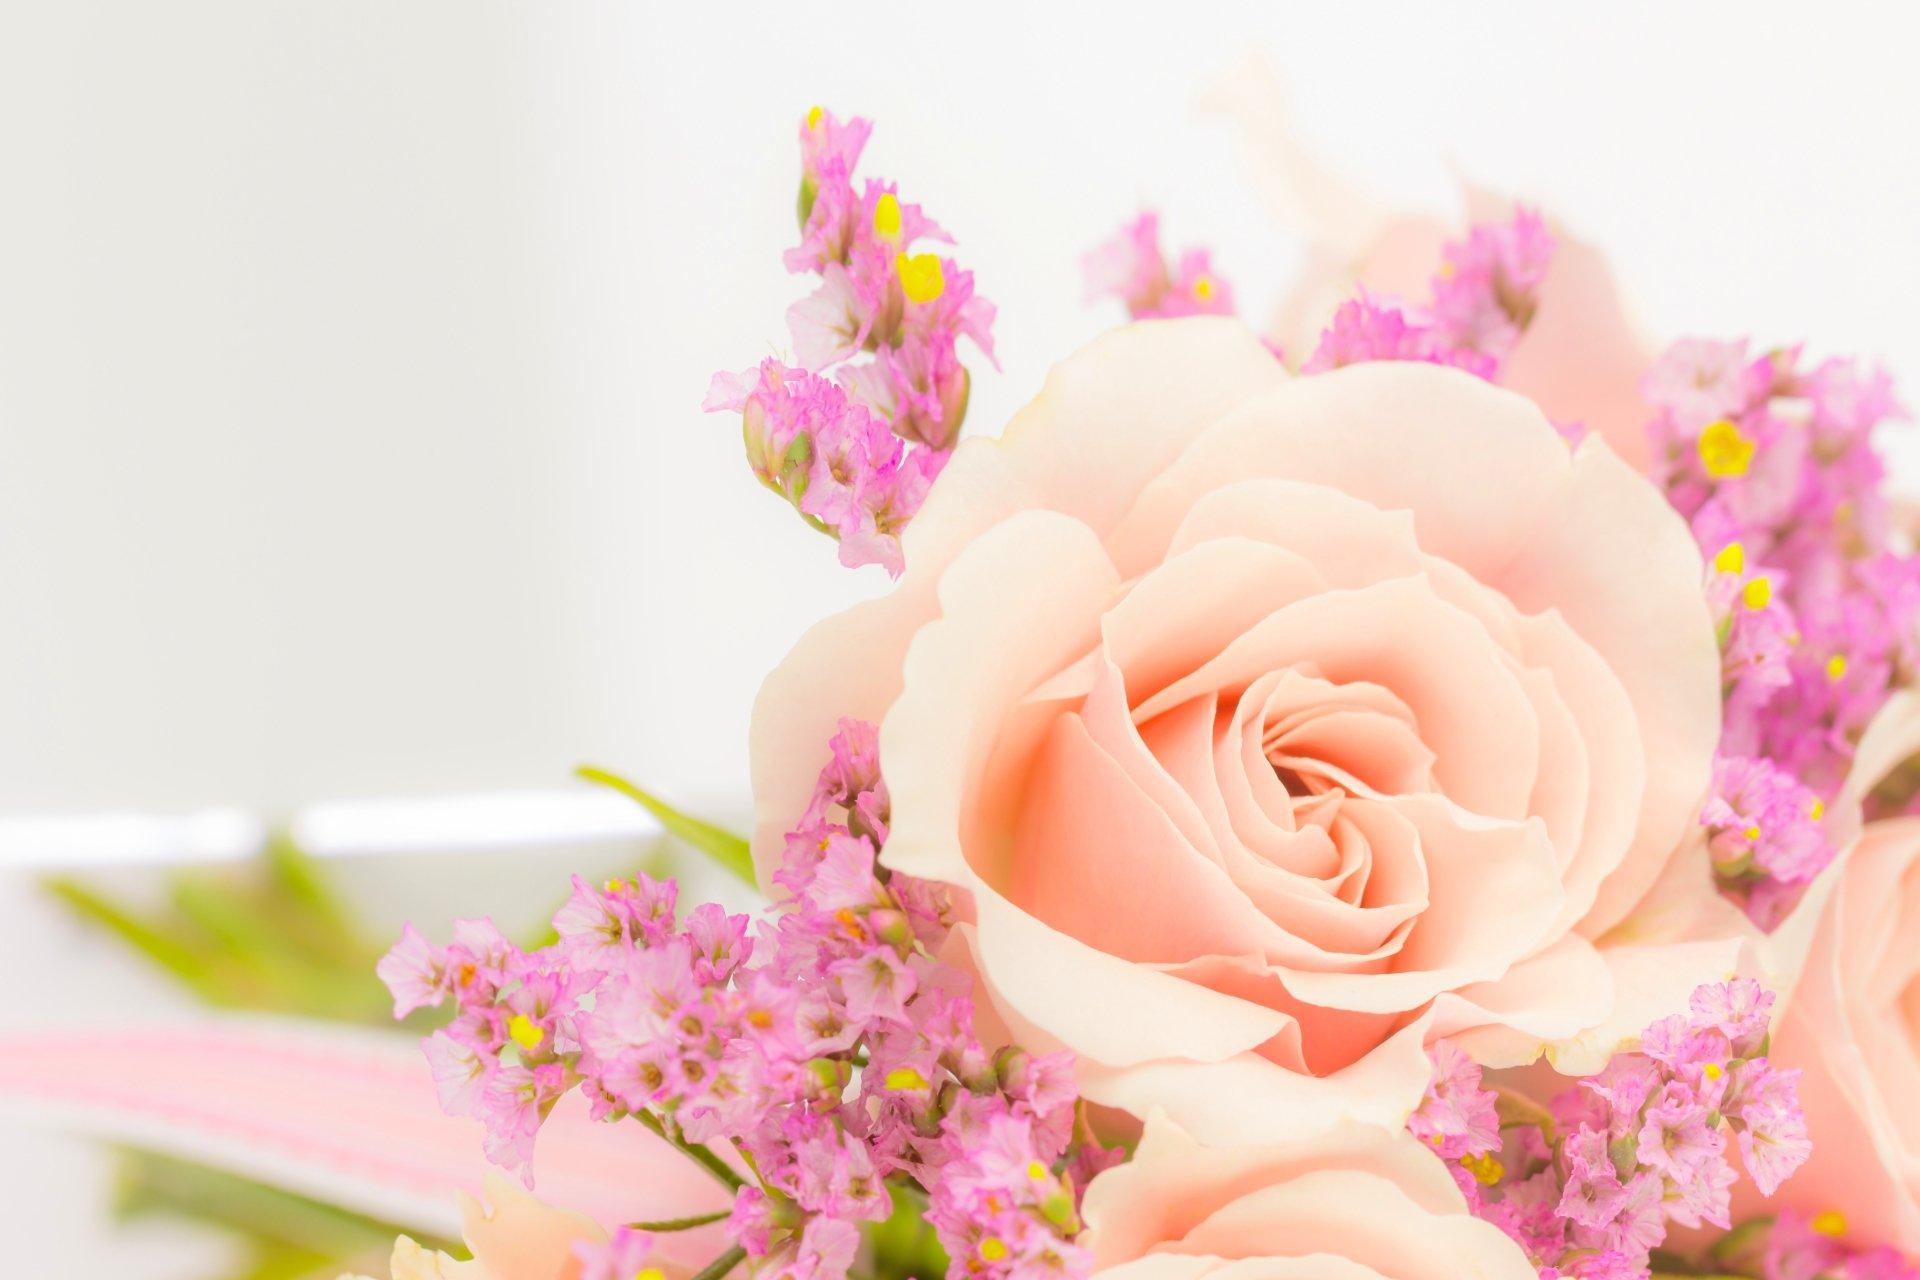 Wall Paper Wide Pink Rose Colours Soft Nature Flower: Soft Pink Rose 5k Retina Ultra HD Wallpaper